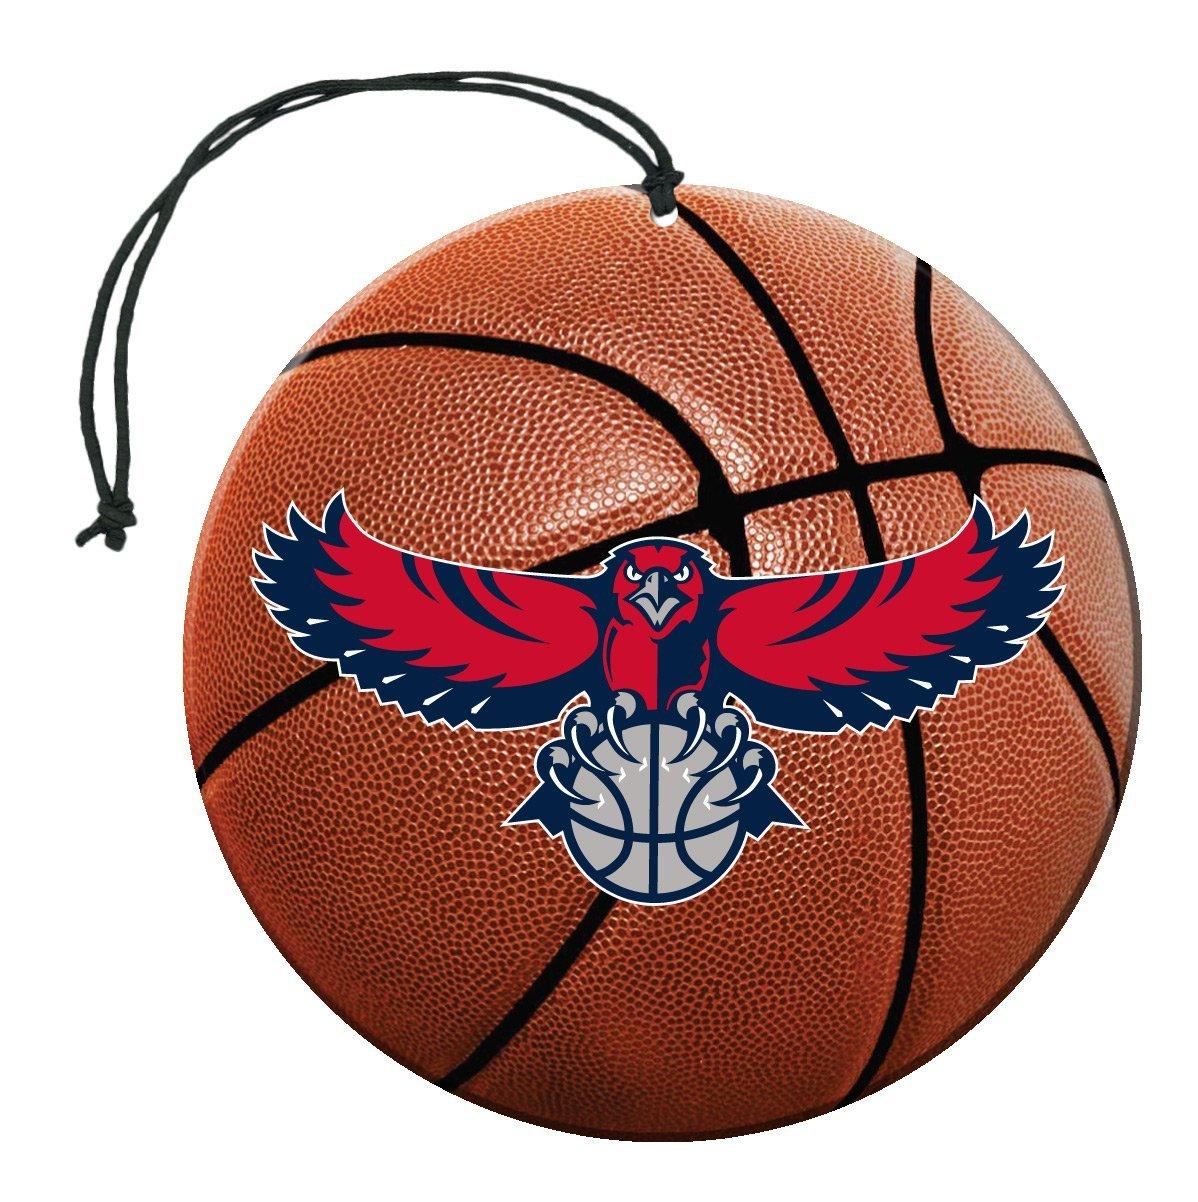 NBA Atlanta Hawks Auto Air Freshener, 3-Pack